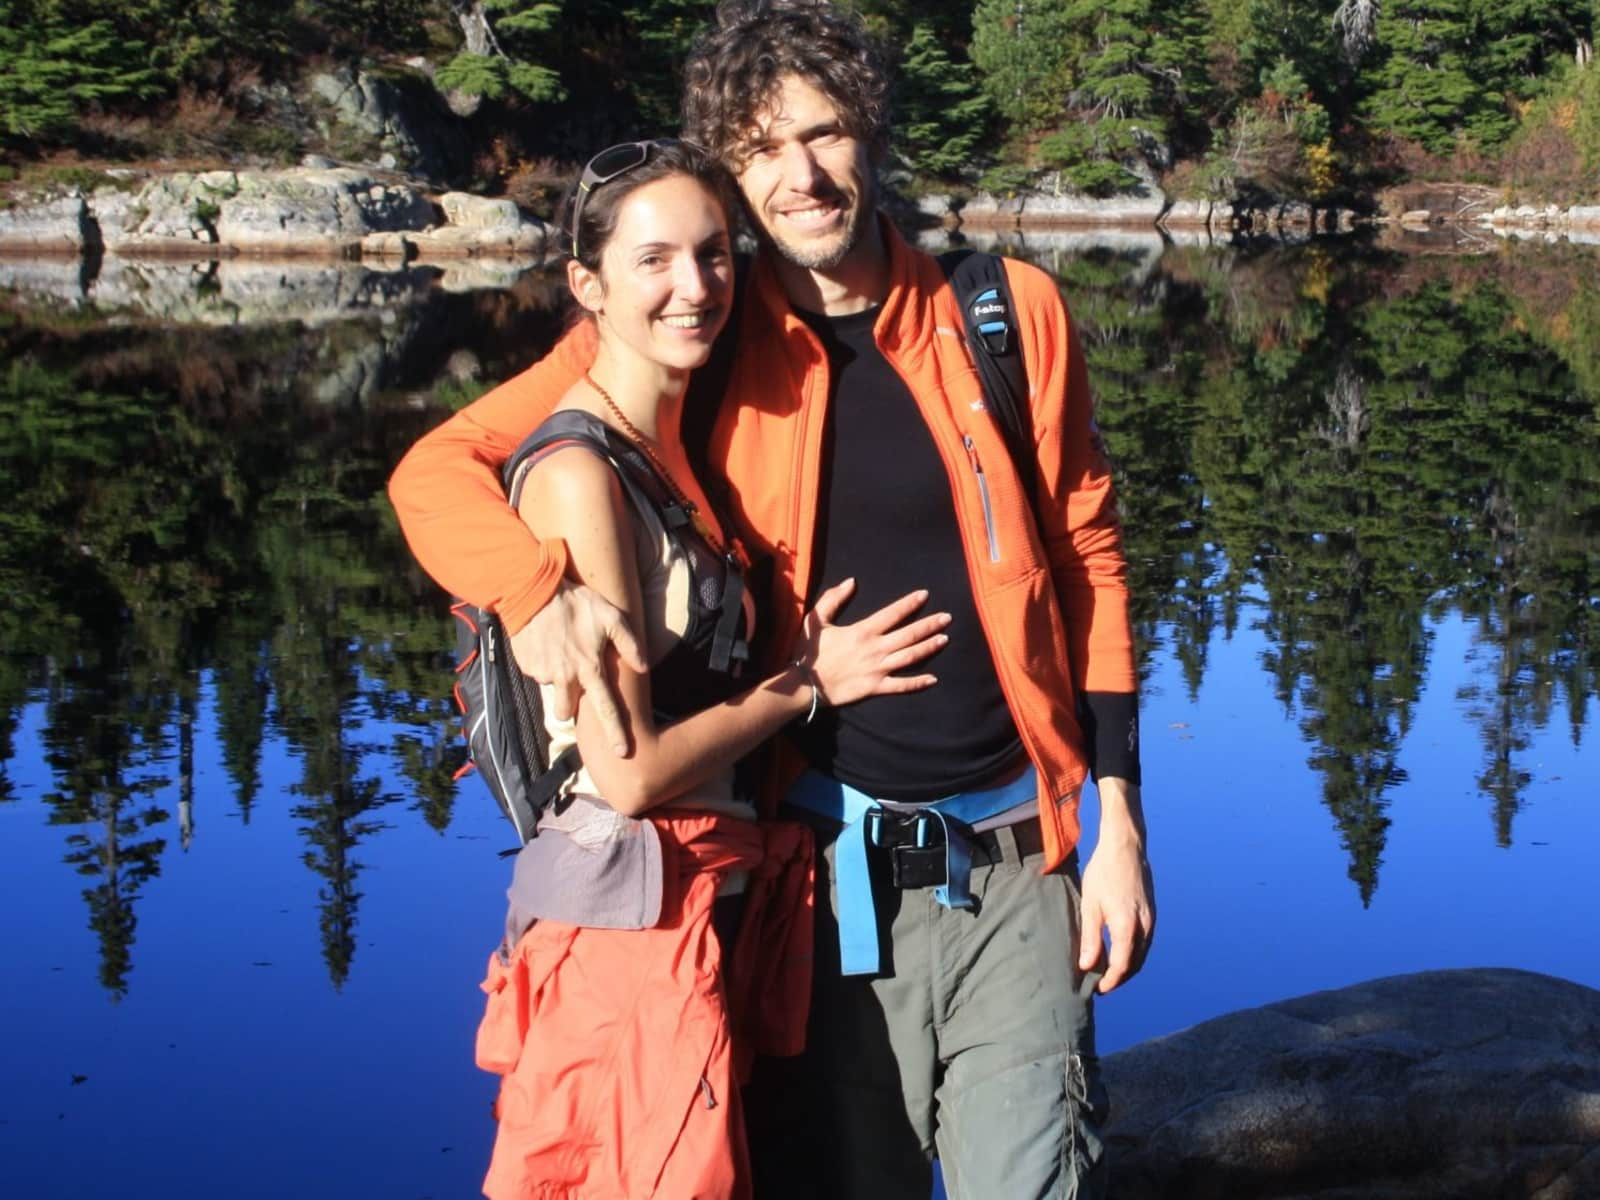 Aurelie & Thomas from Vancouver, British Columbia, Canada